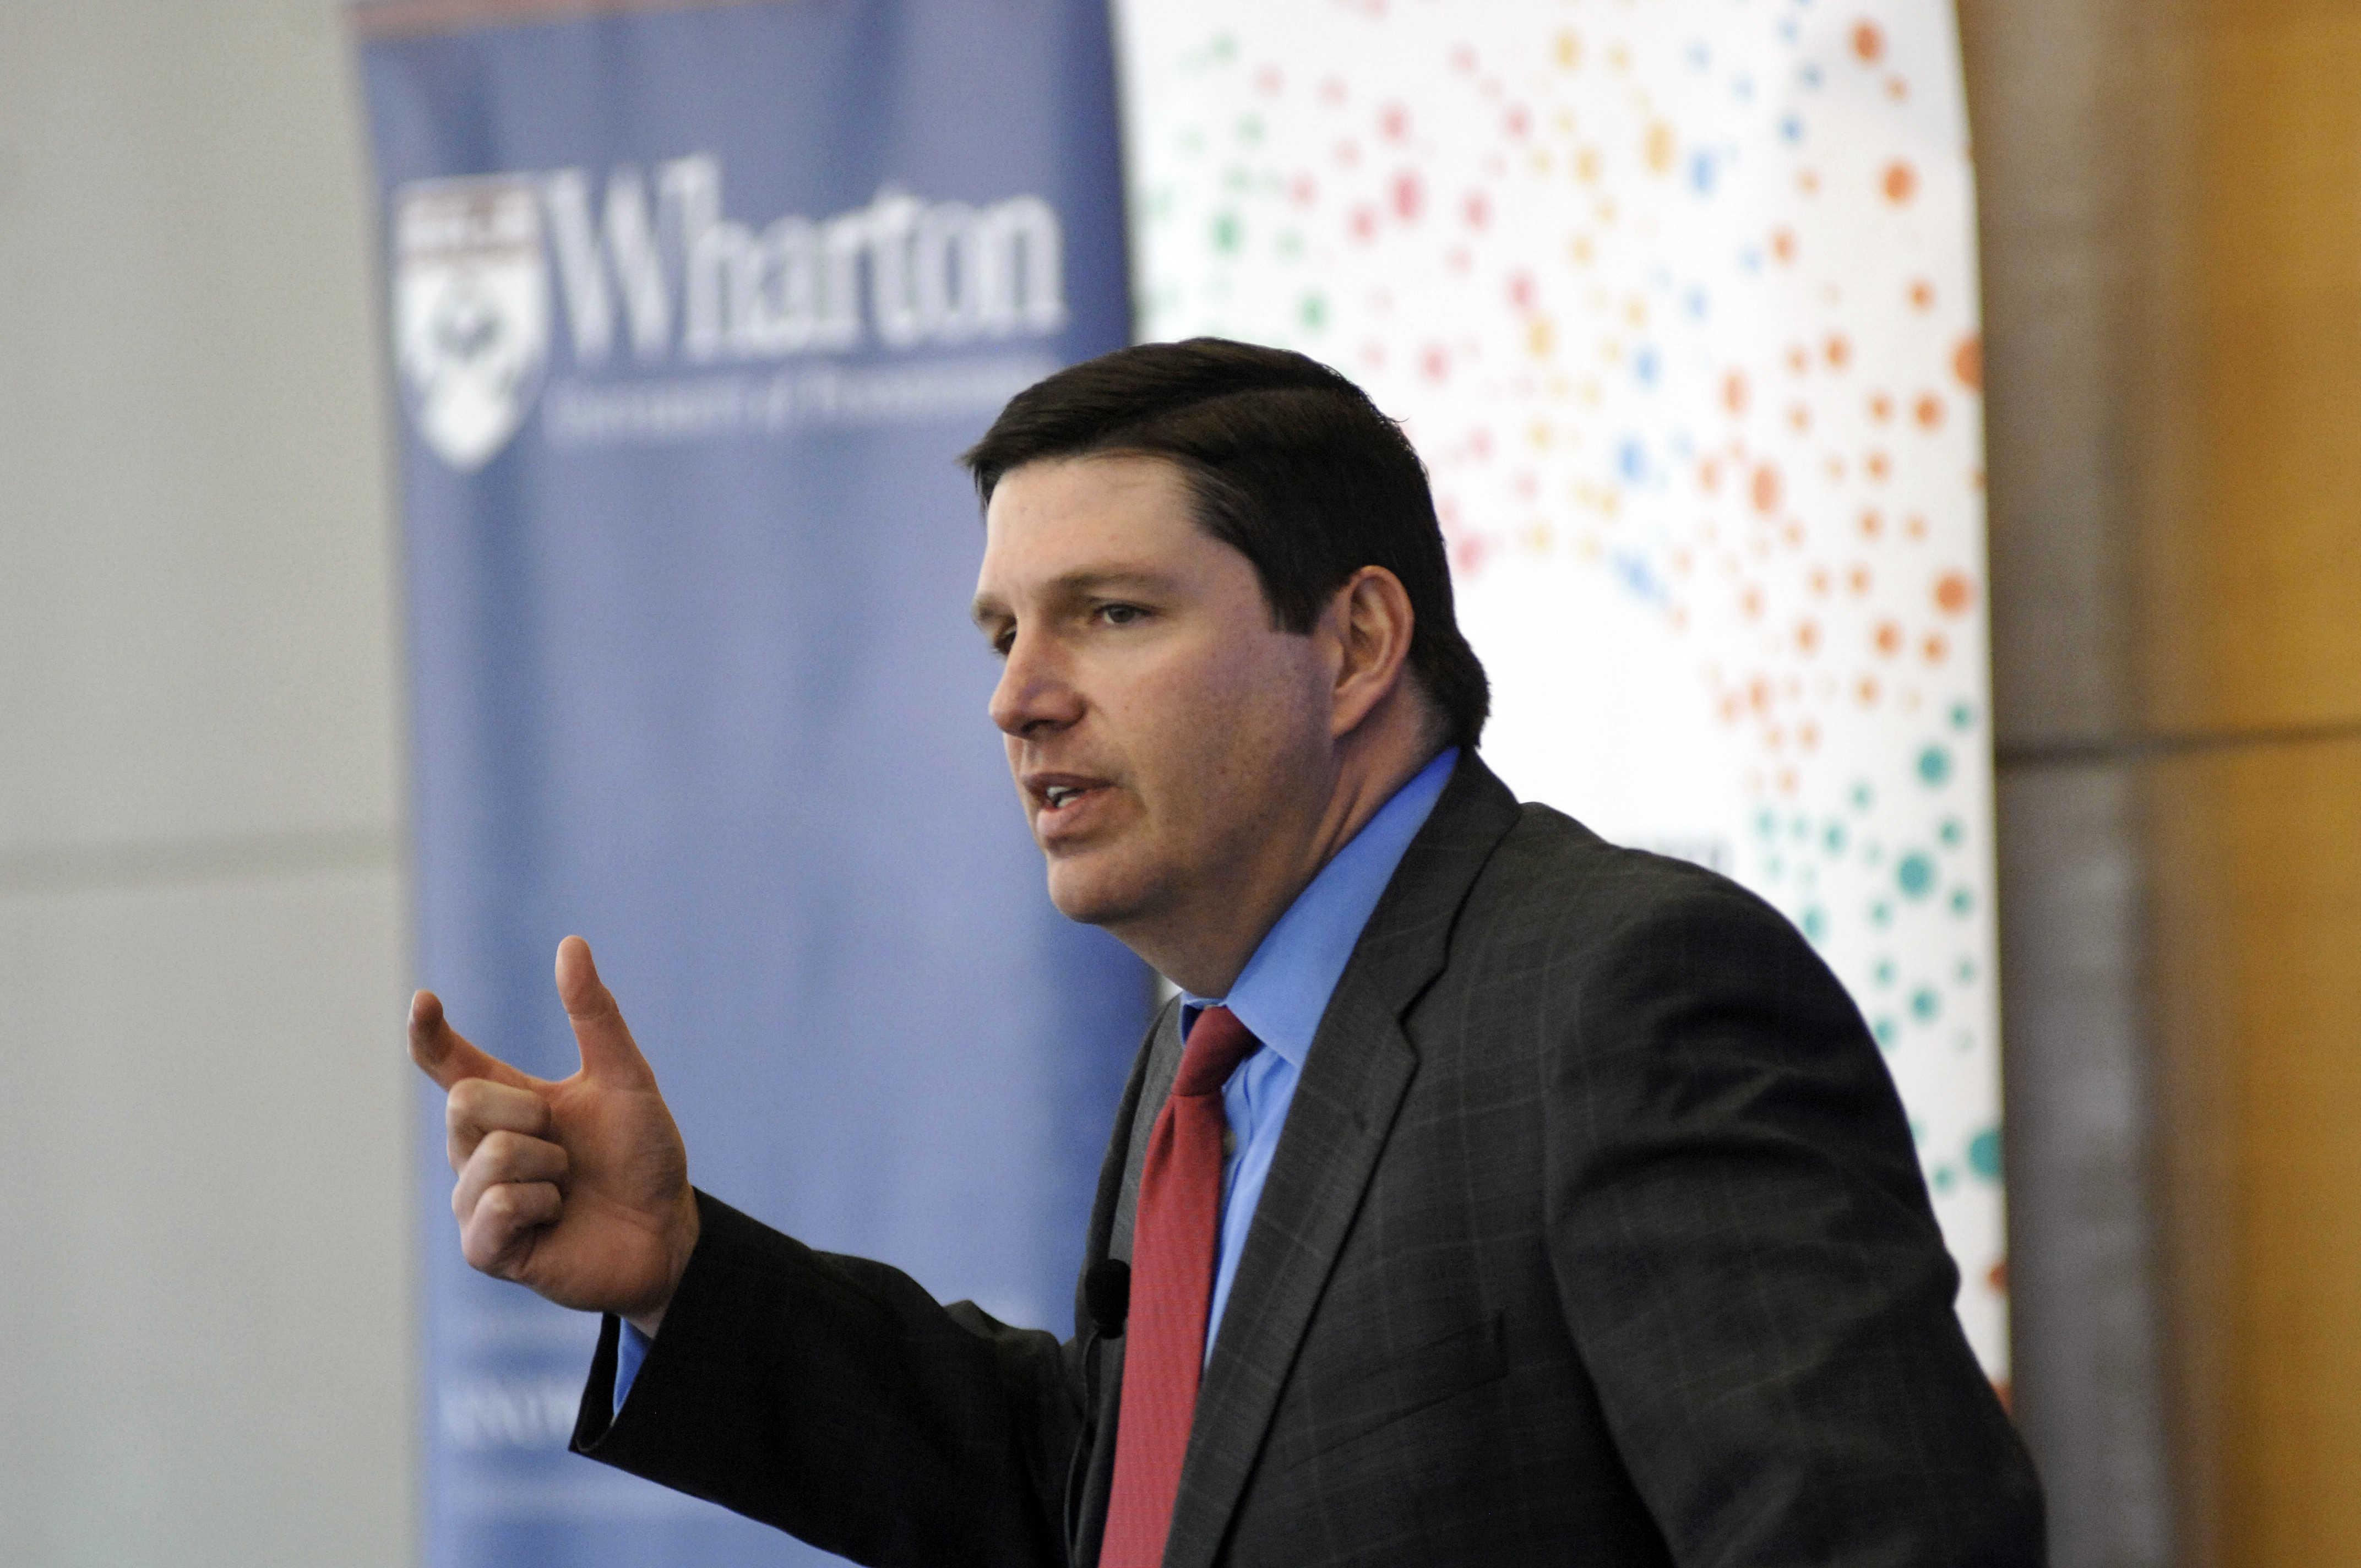 Coast To Coast Sirius Xm >> MassMutual CEO Roger Crandall Talks Leadership - Wharton ...